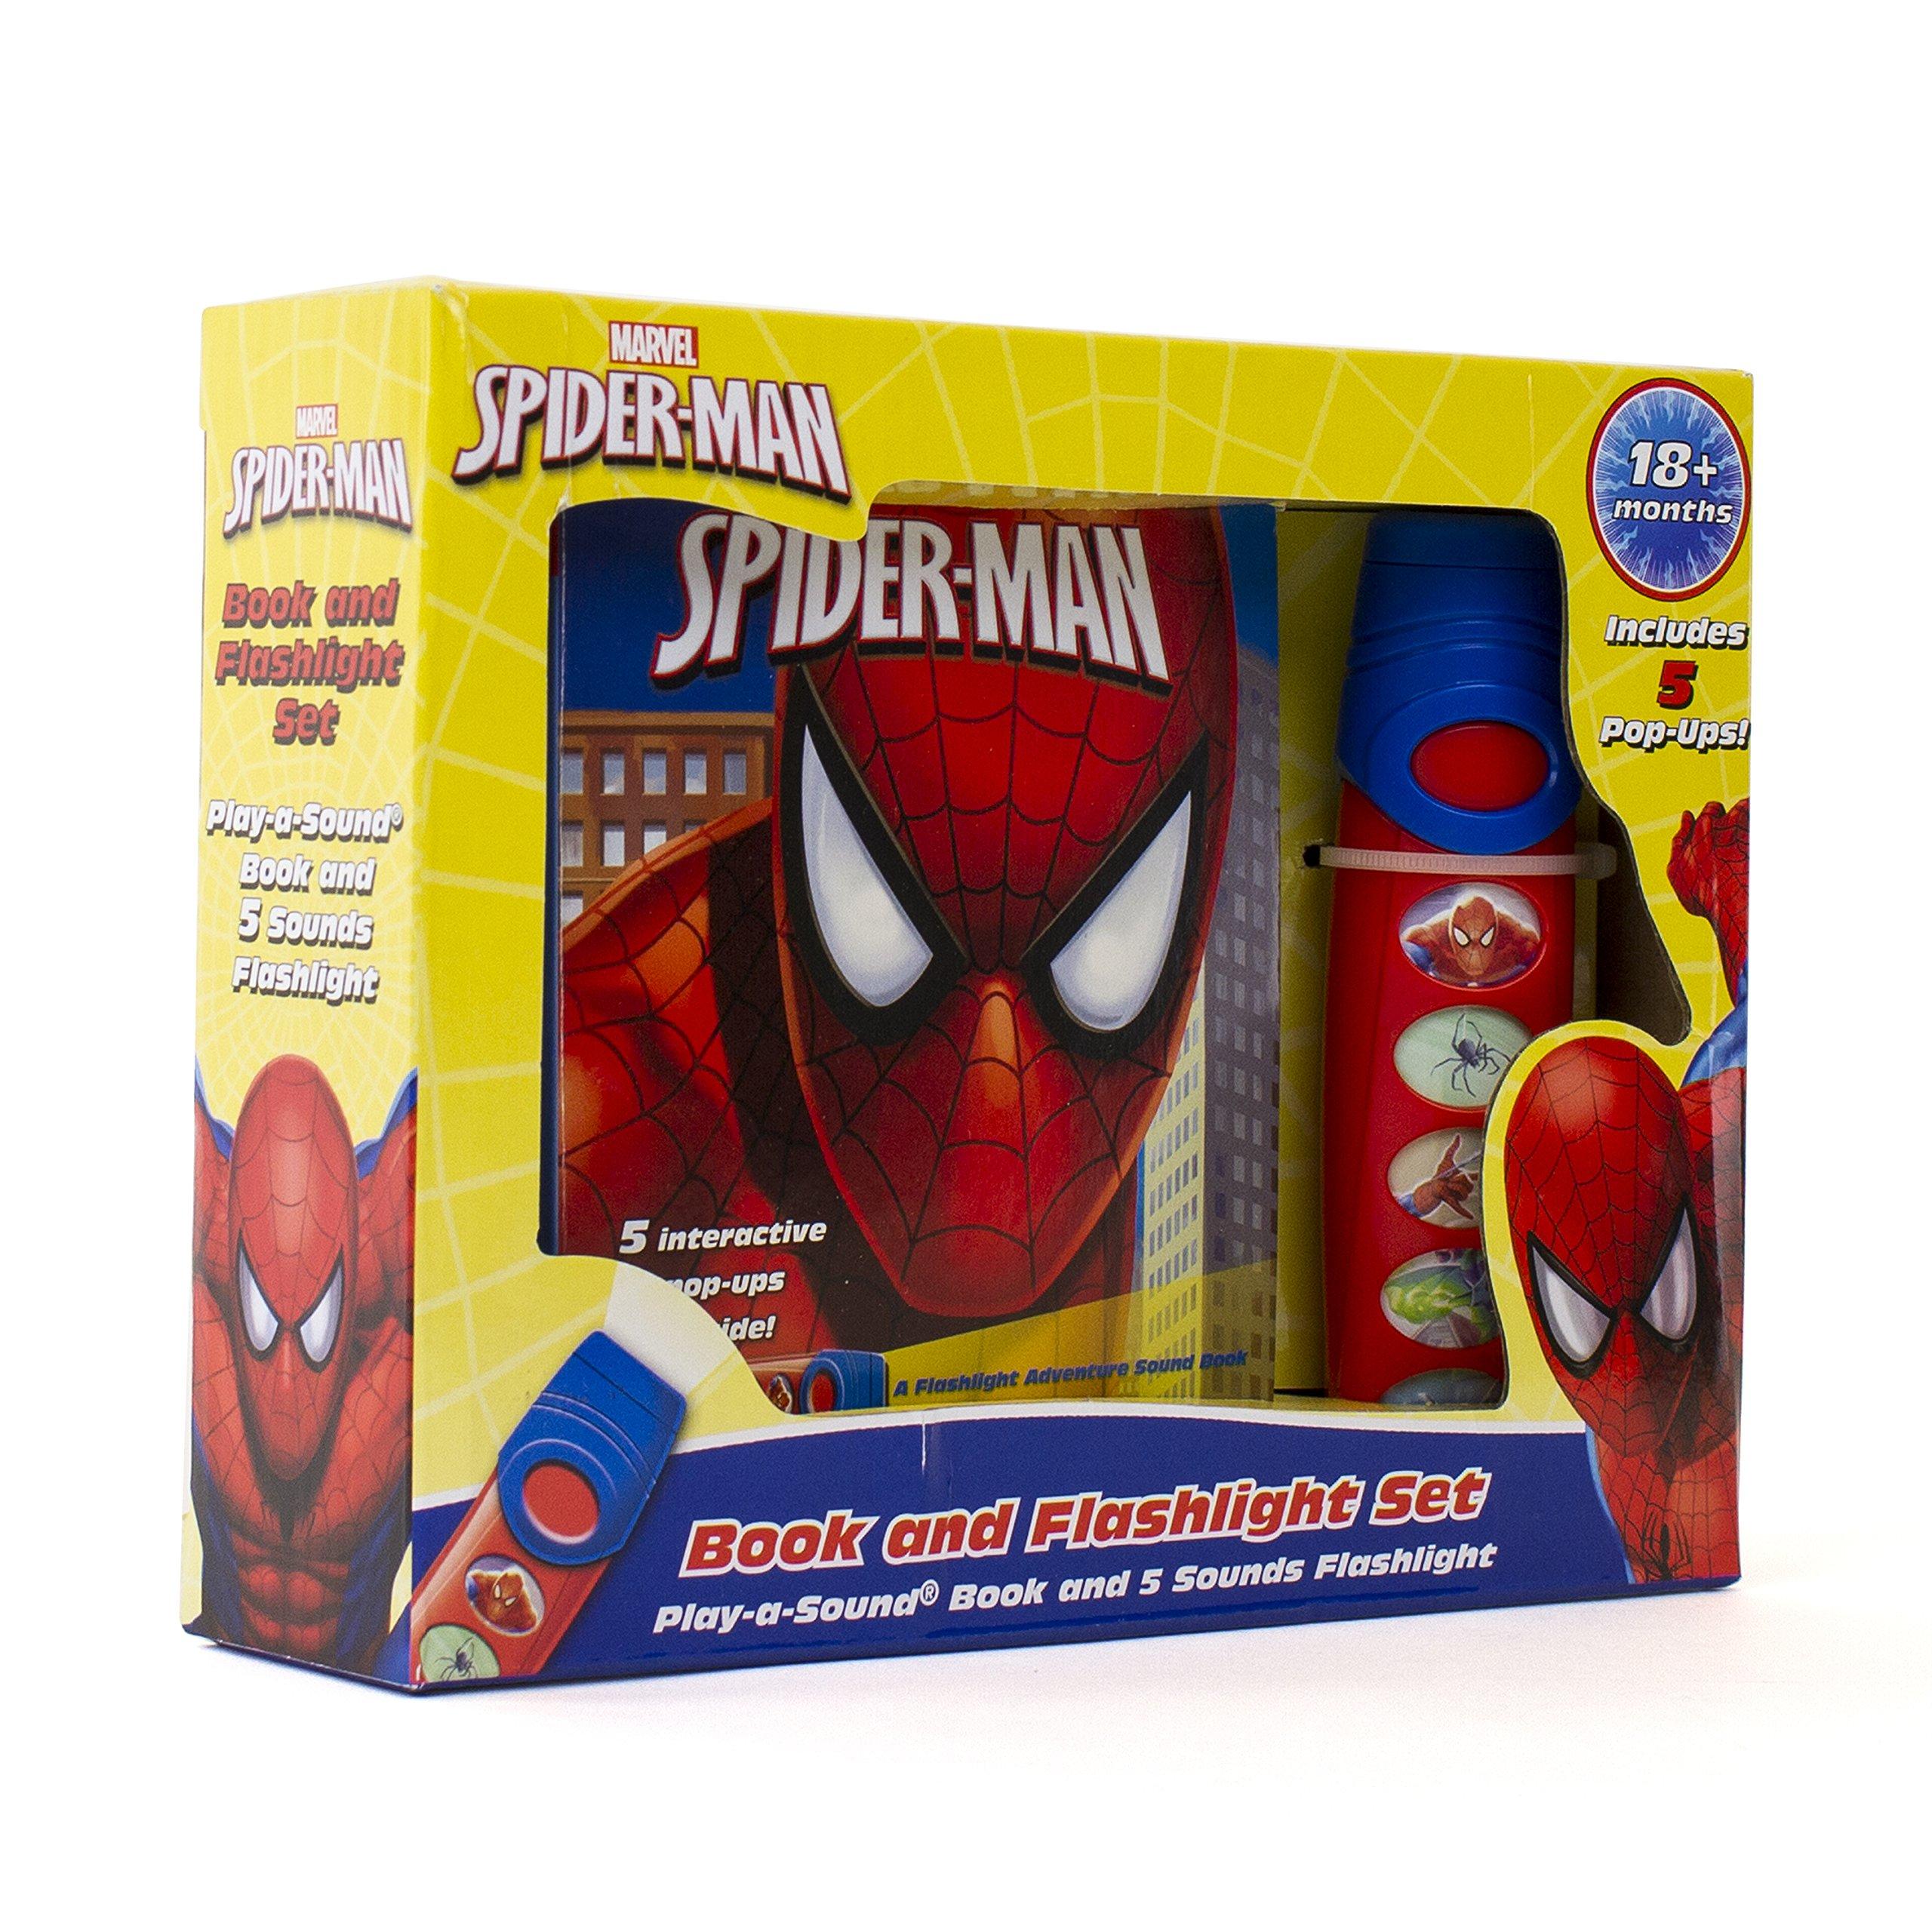 Marvel - Spider-man Little Flashlight Adventure Pop-Up Board Book - Play-a-Sound - PI Kids